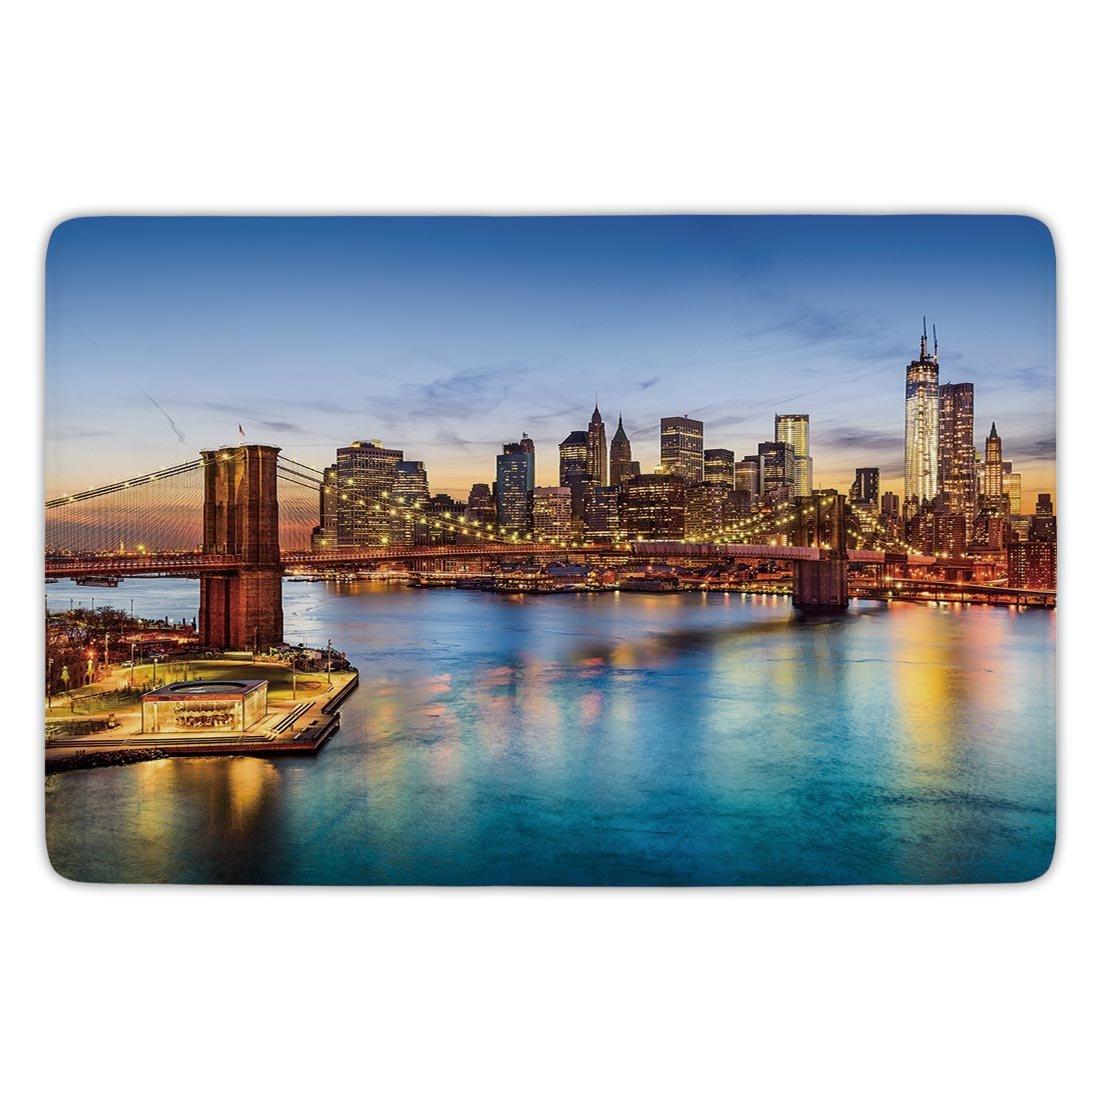 Bathroom bath rug kitchen floor mat carpetunited statesnew york city skyline over east river brooklyn bridge twilight decorativeblue dark orange yellow